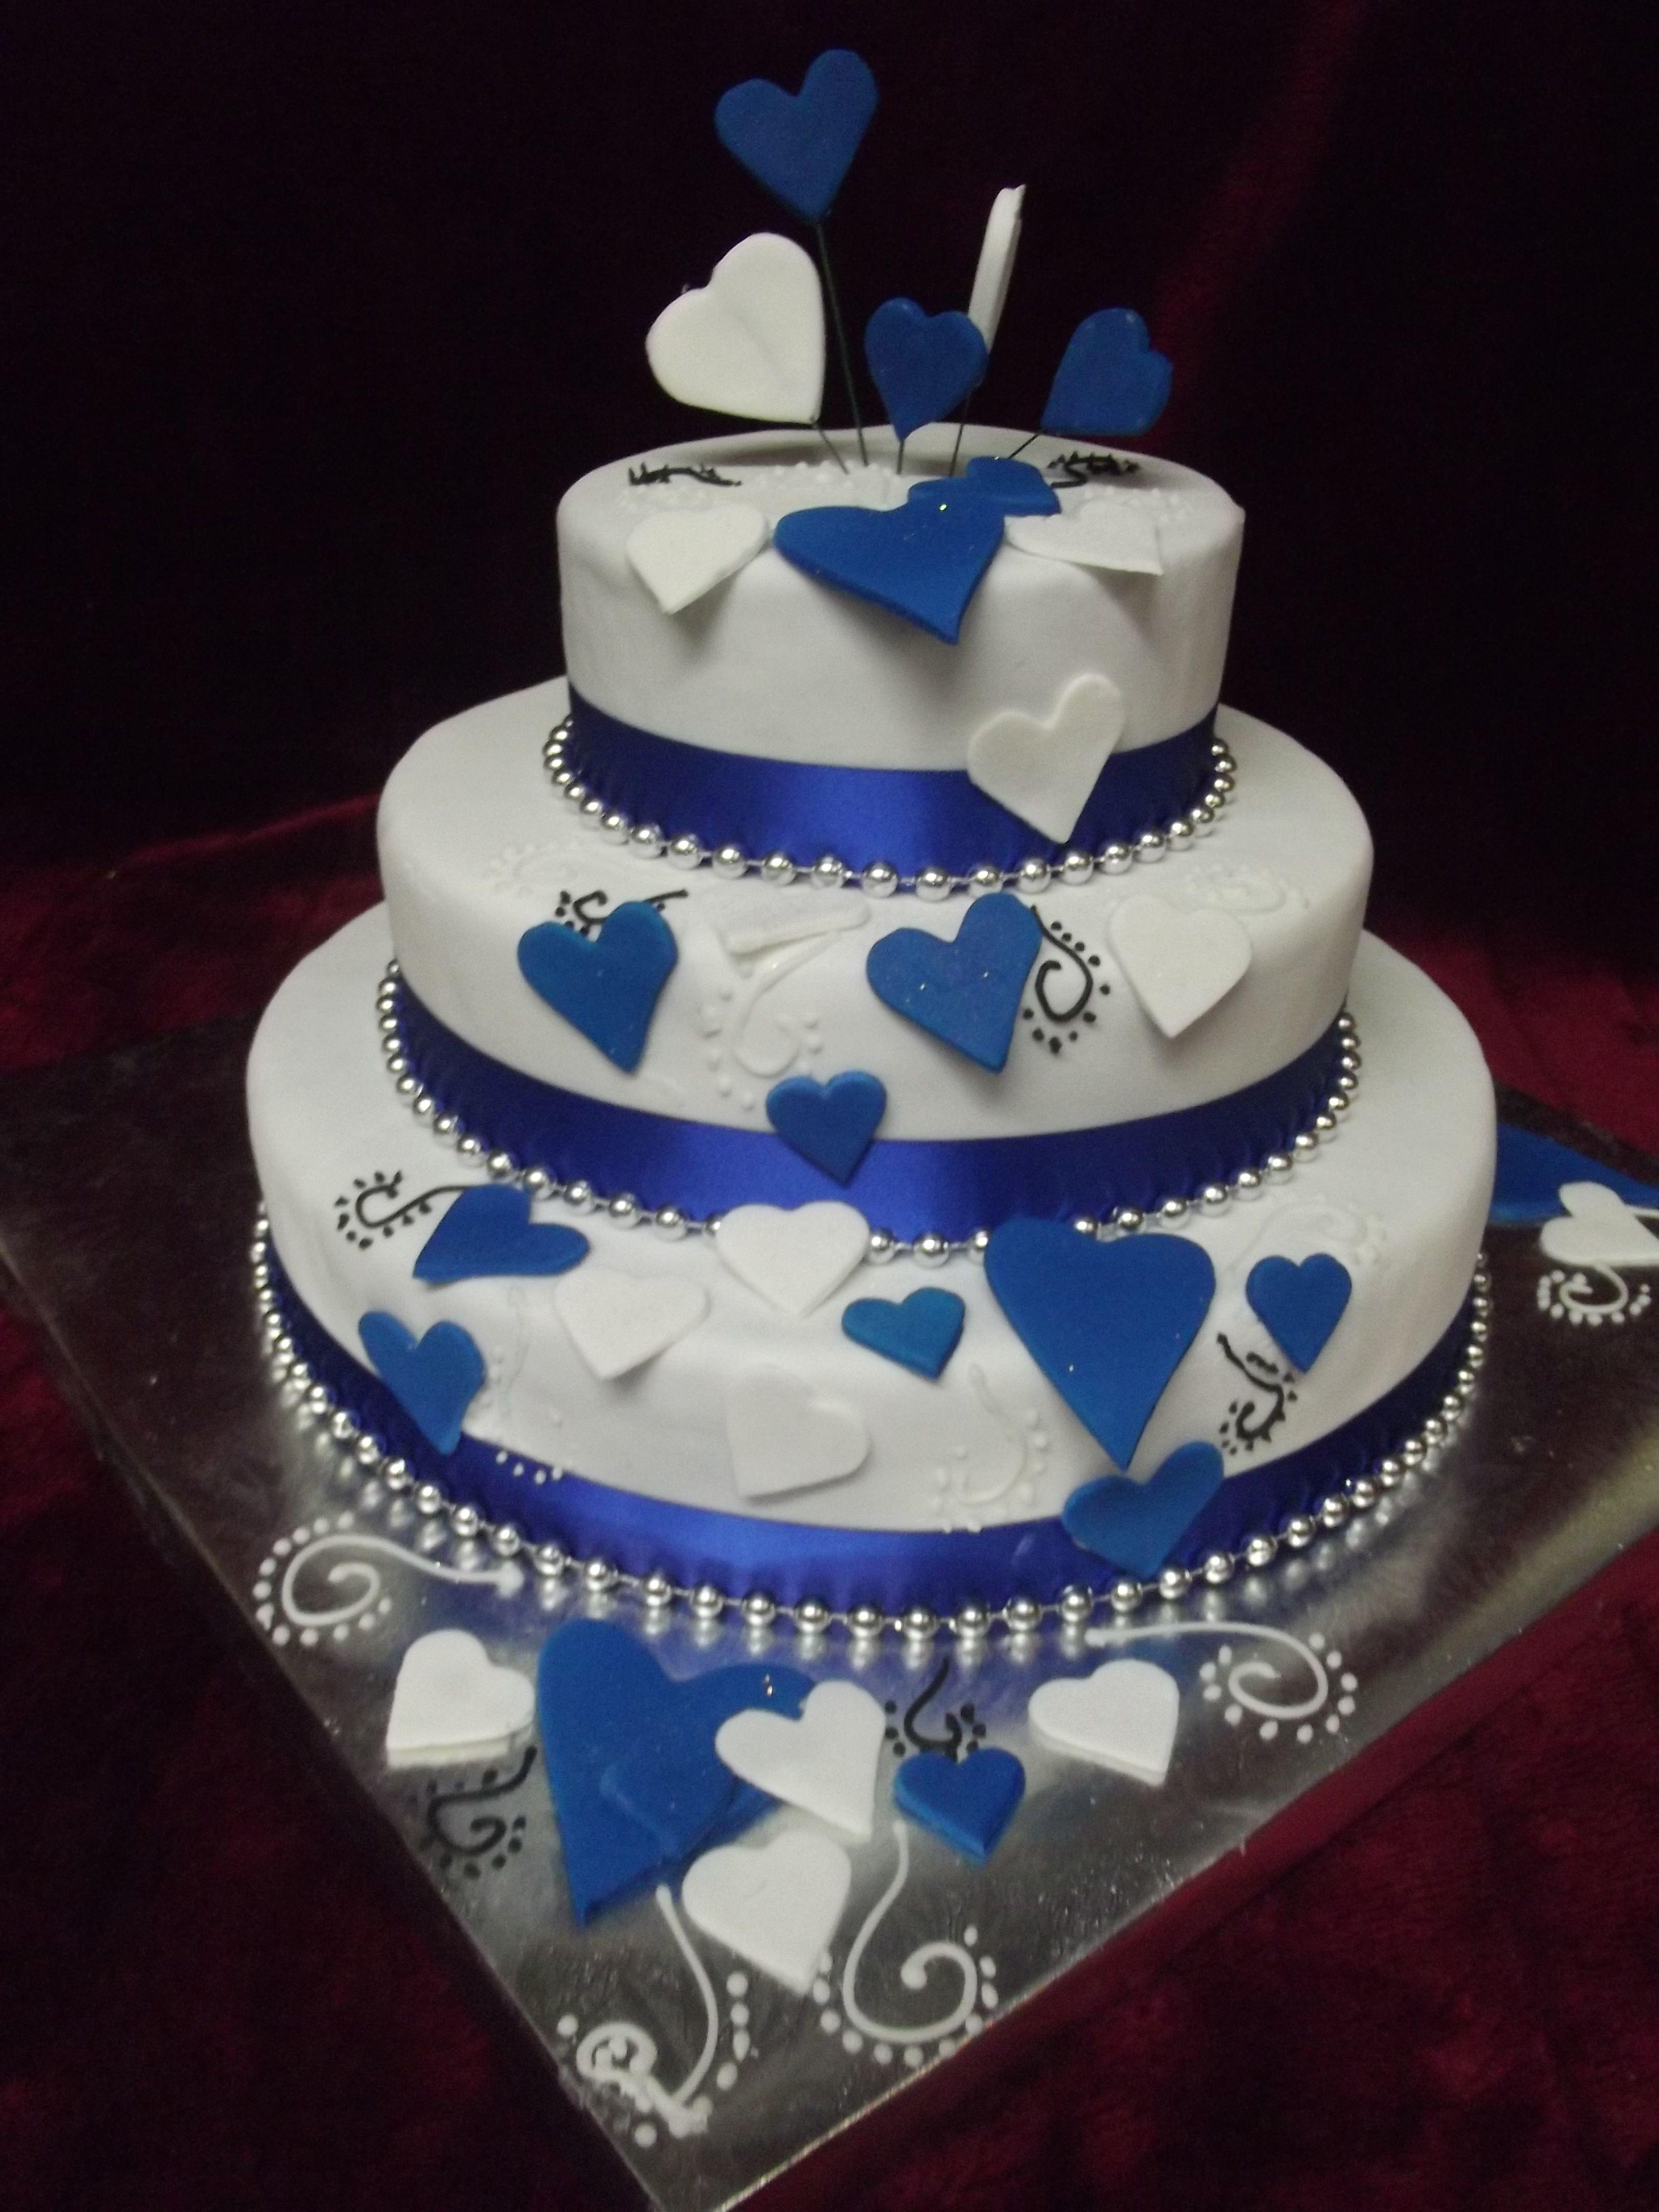 Affordable range wedding cakes nz best wedding cakes in